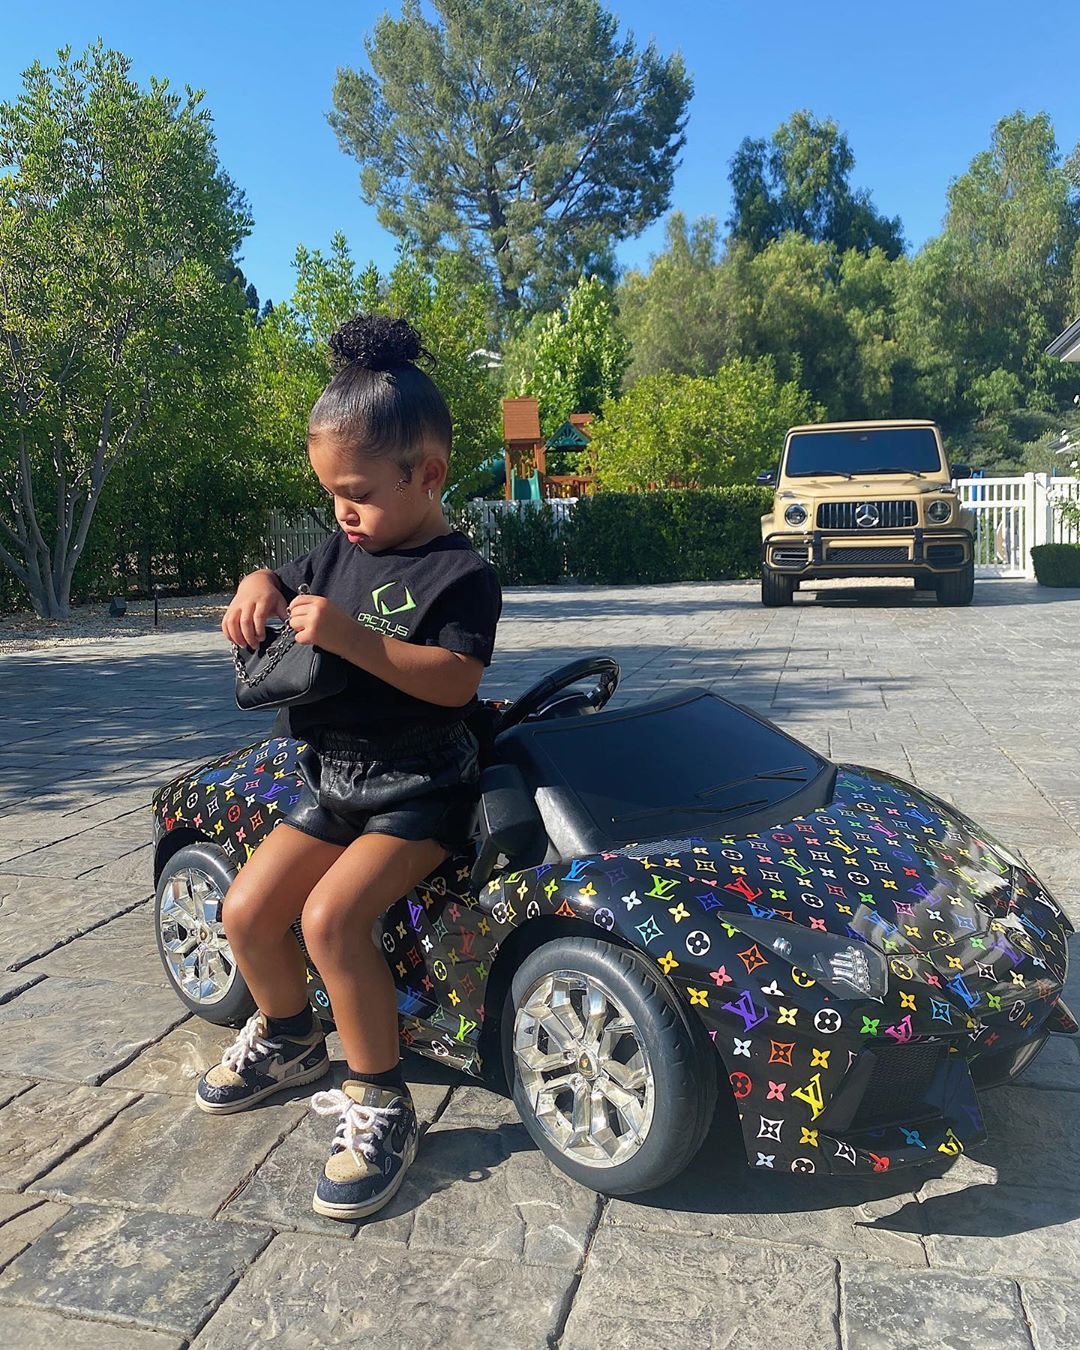 Kylie Jenner's Daughter Stormi Has a Louis Vuitton Toy Car: Photos